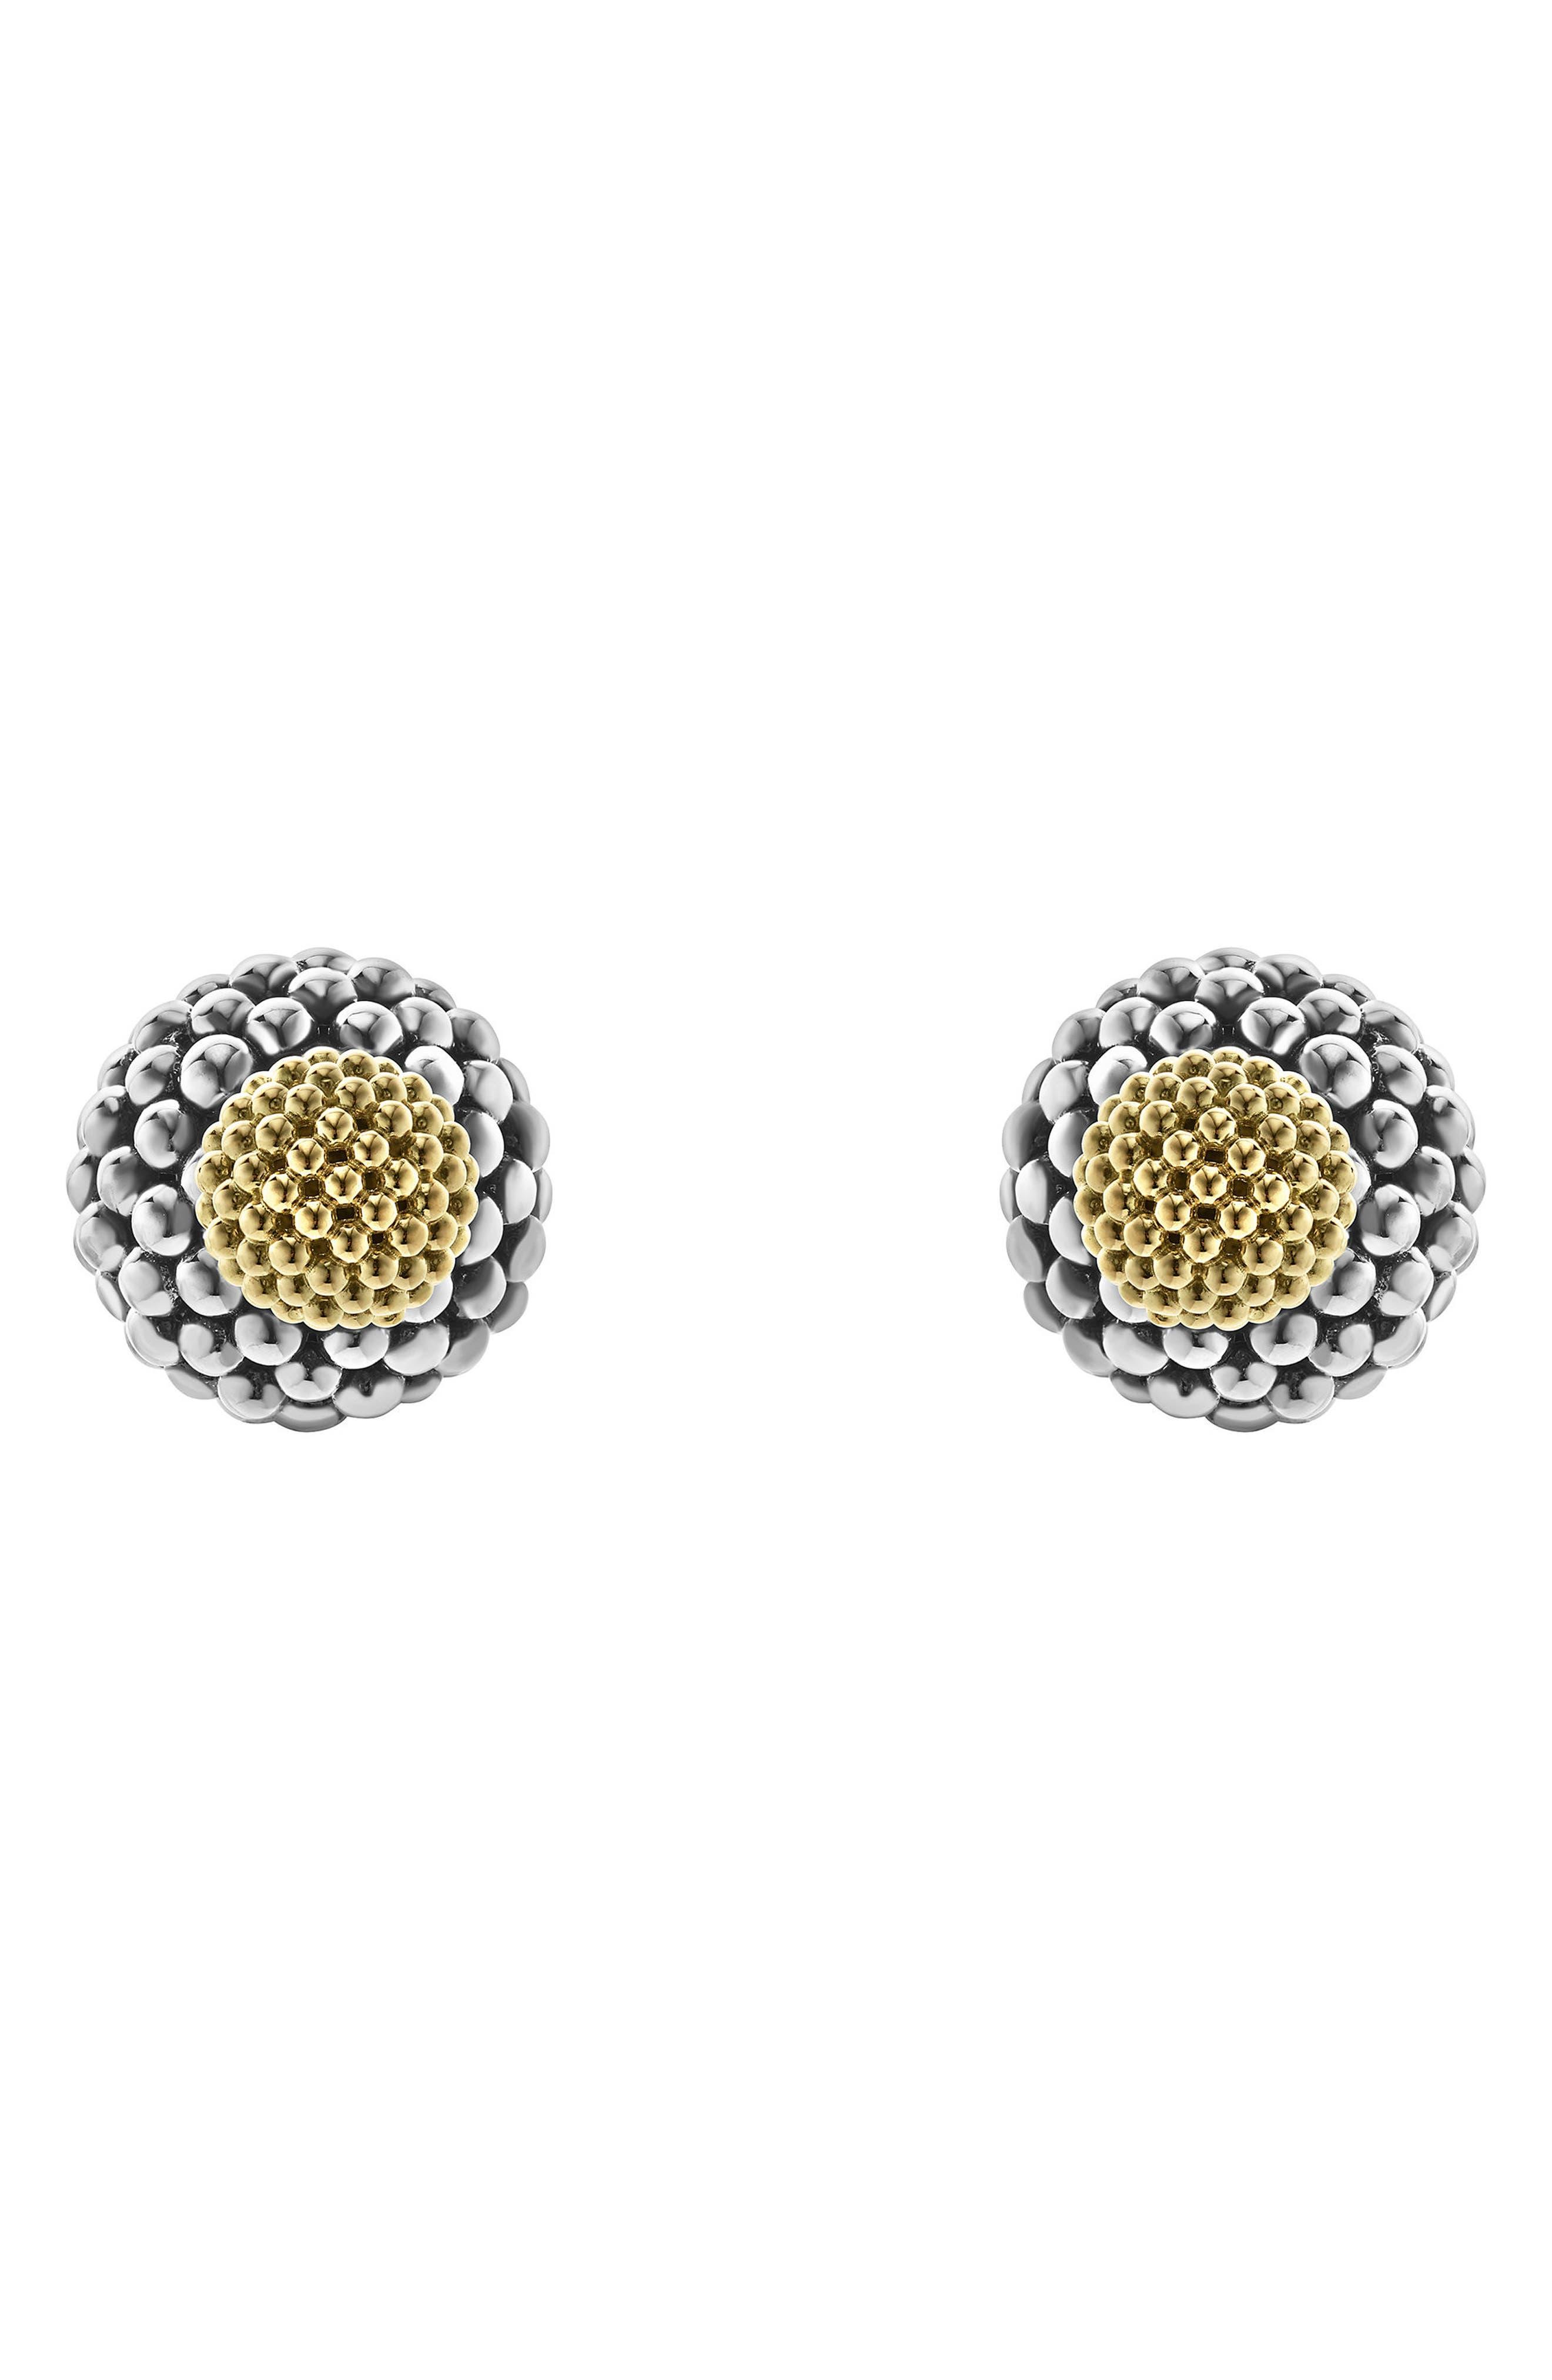 LAGOS Caviar Ball Stud Earrings